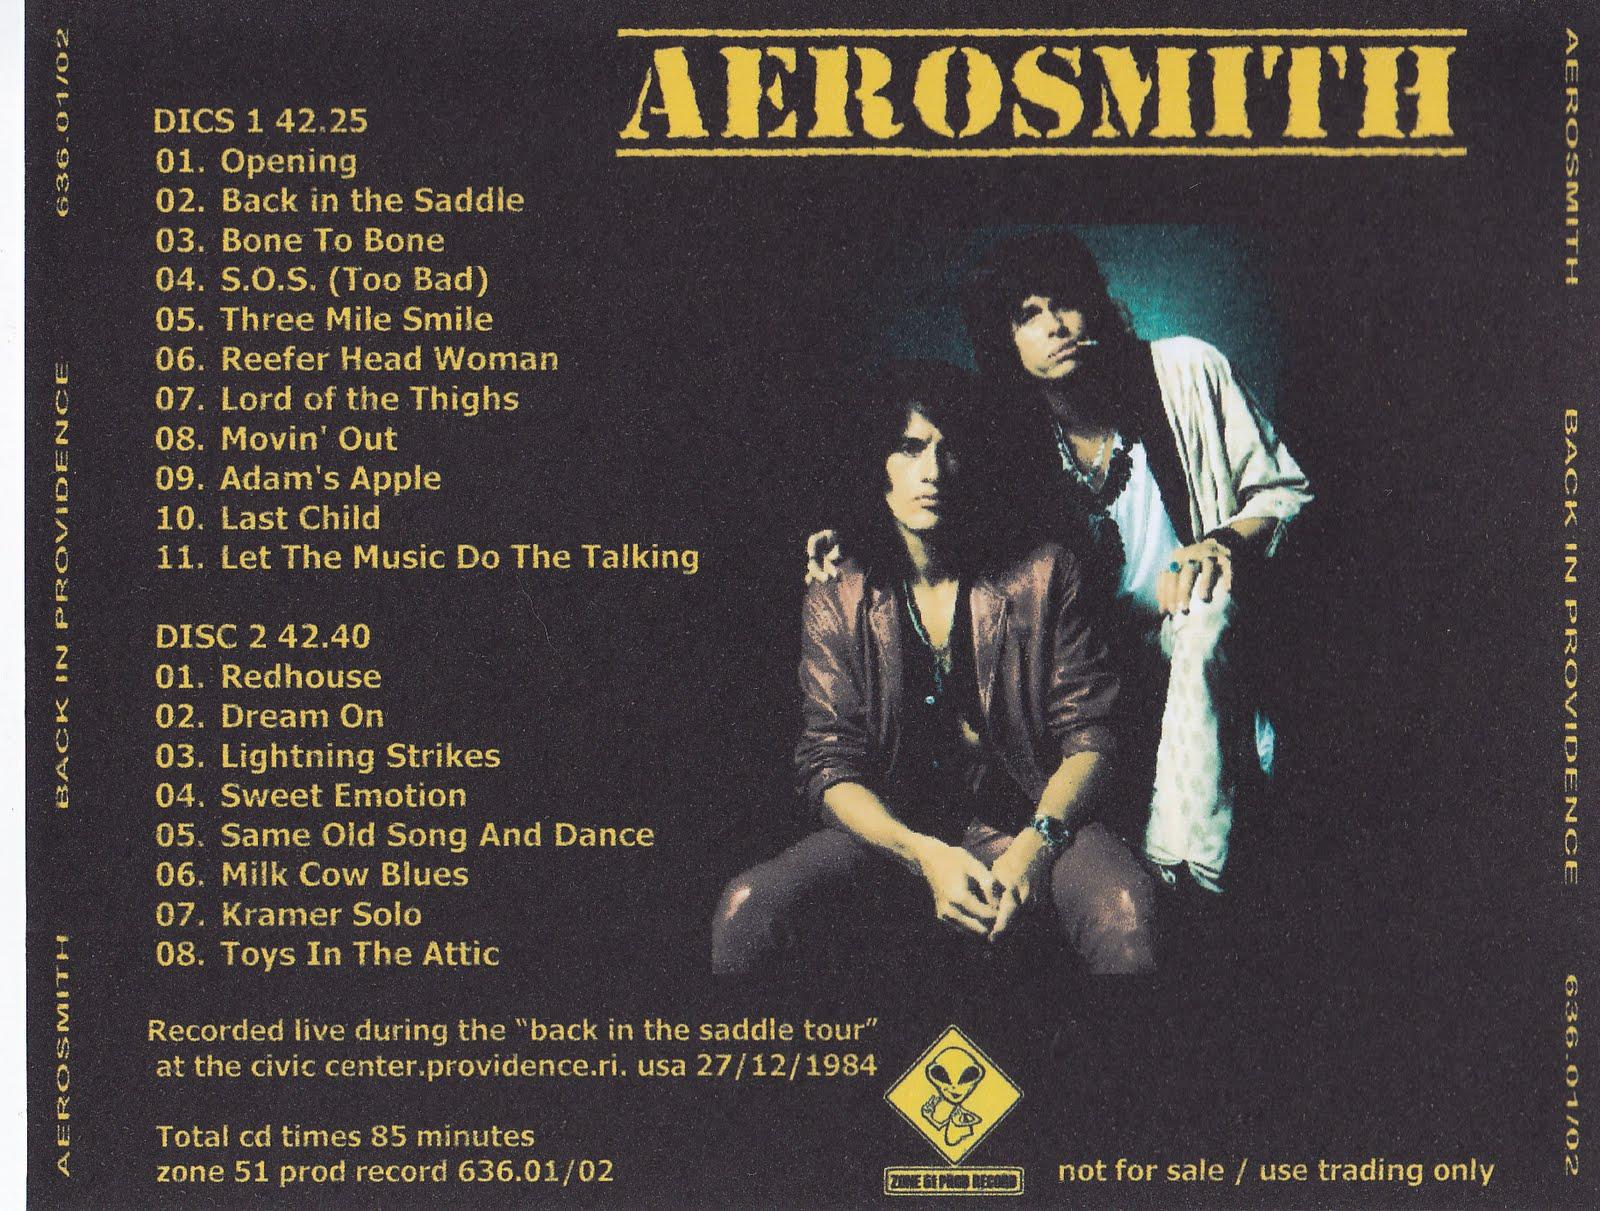 Aerosmith Bootlegs Cover Arts Back In Providence 84